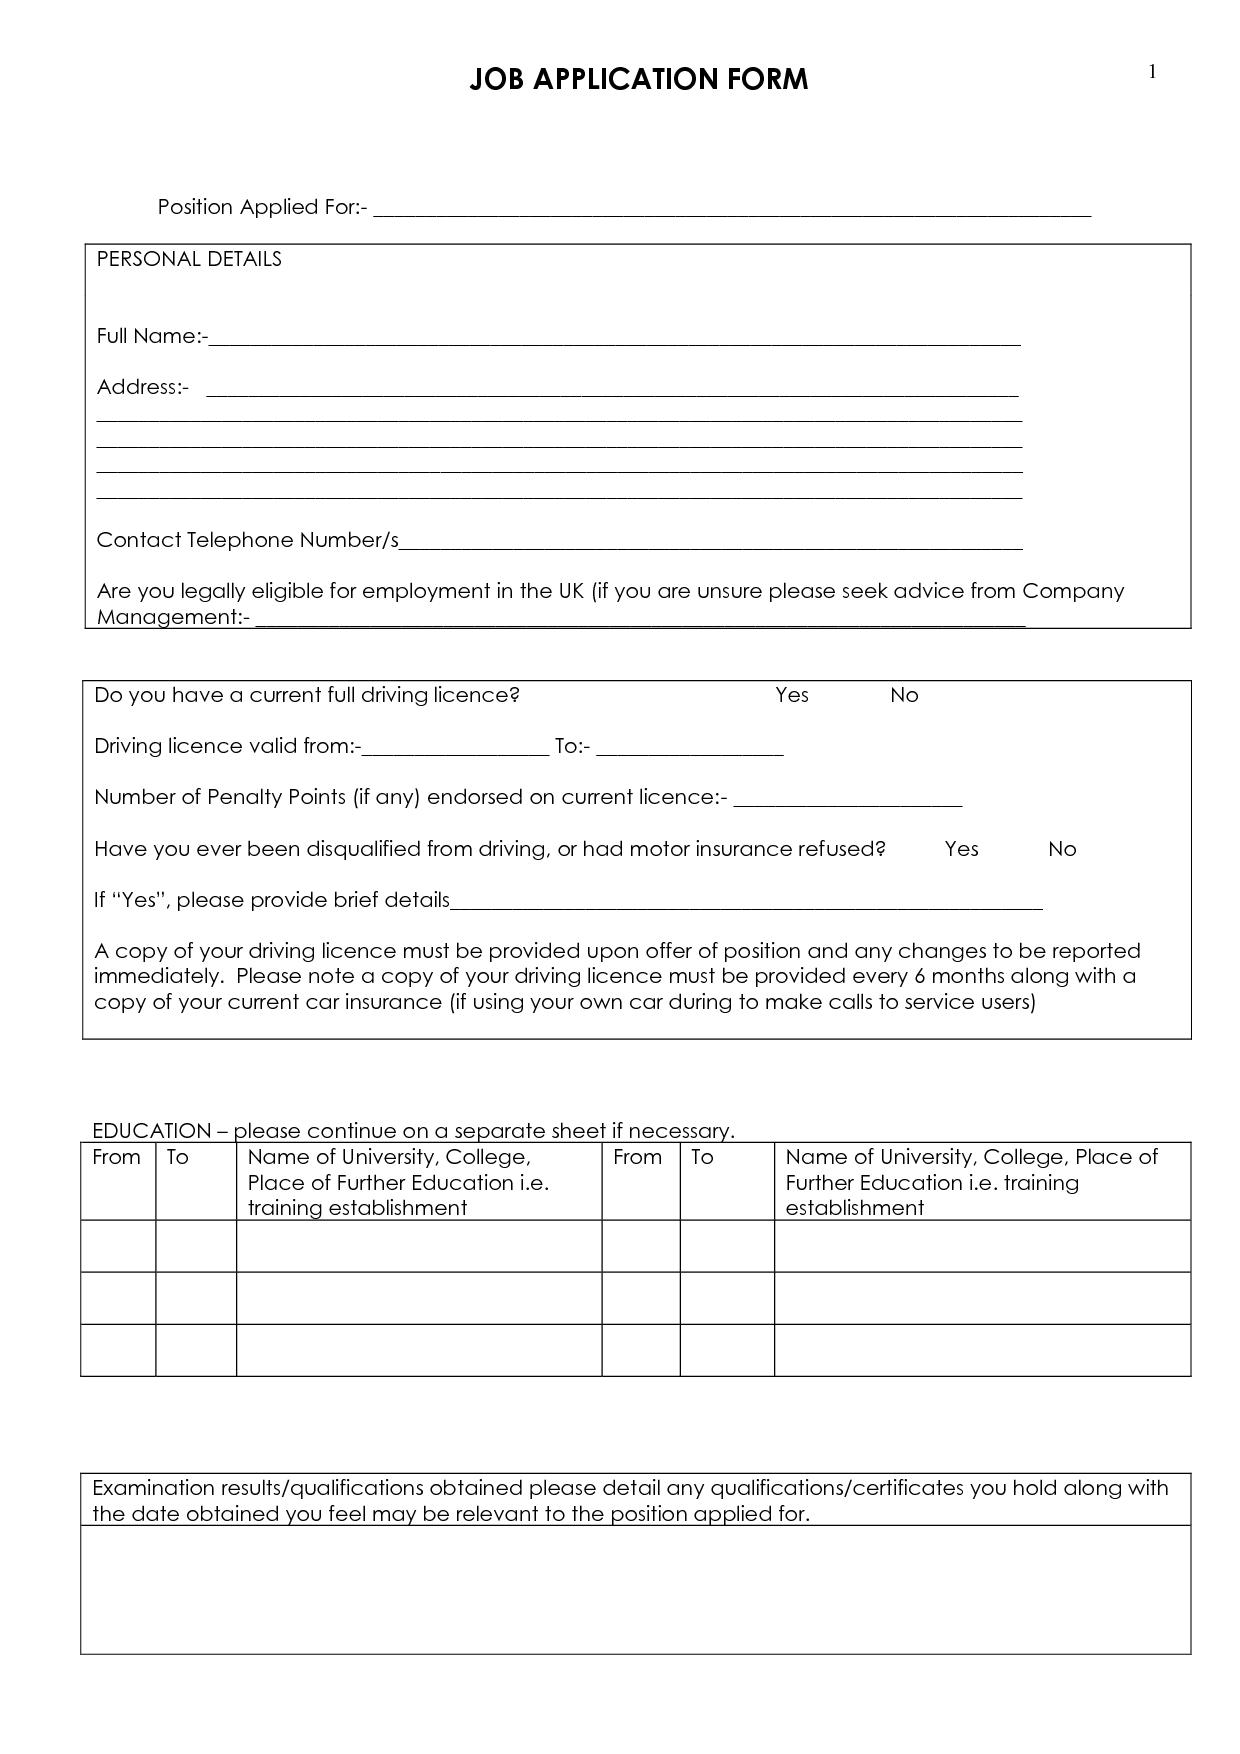 Job Application Form To Print